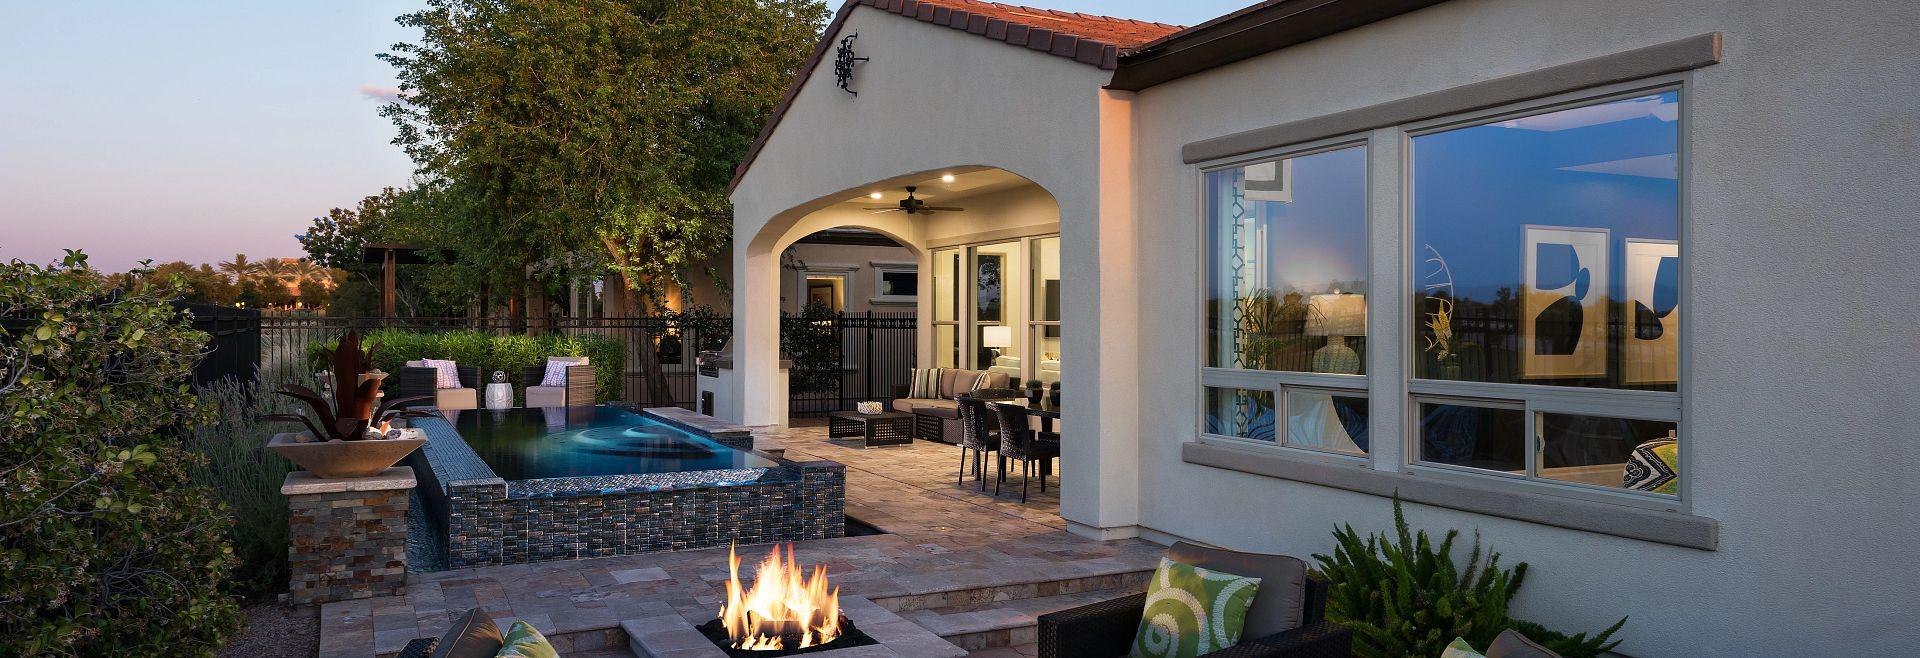 Encanterra by Shea Homes in Queen Creek, AZ